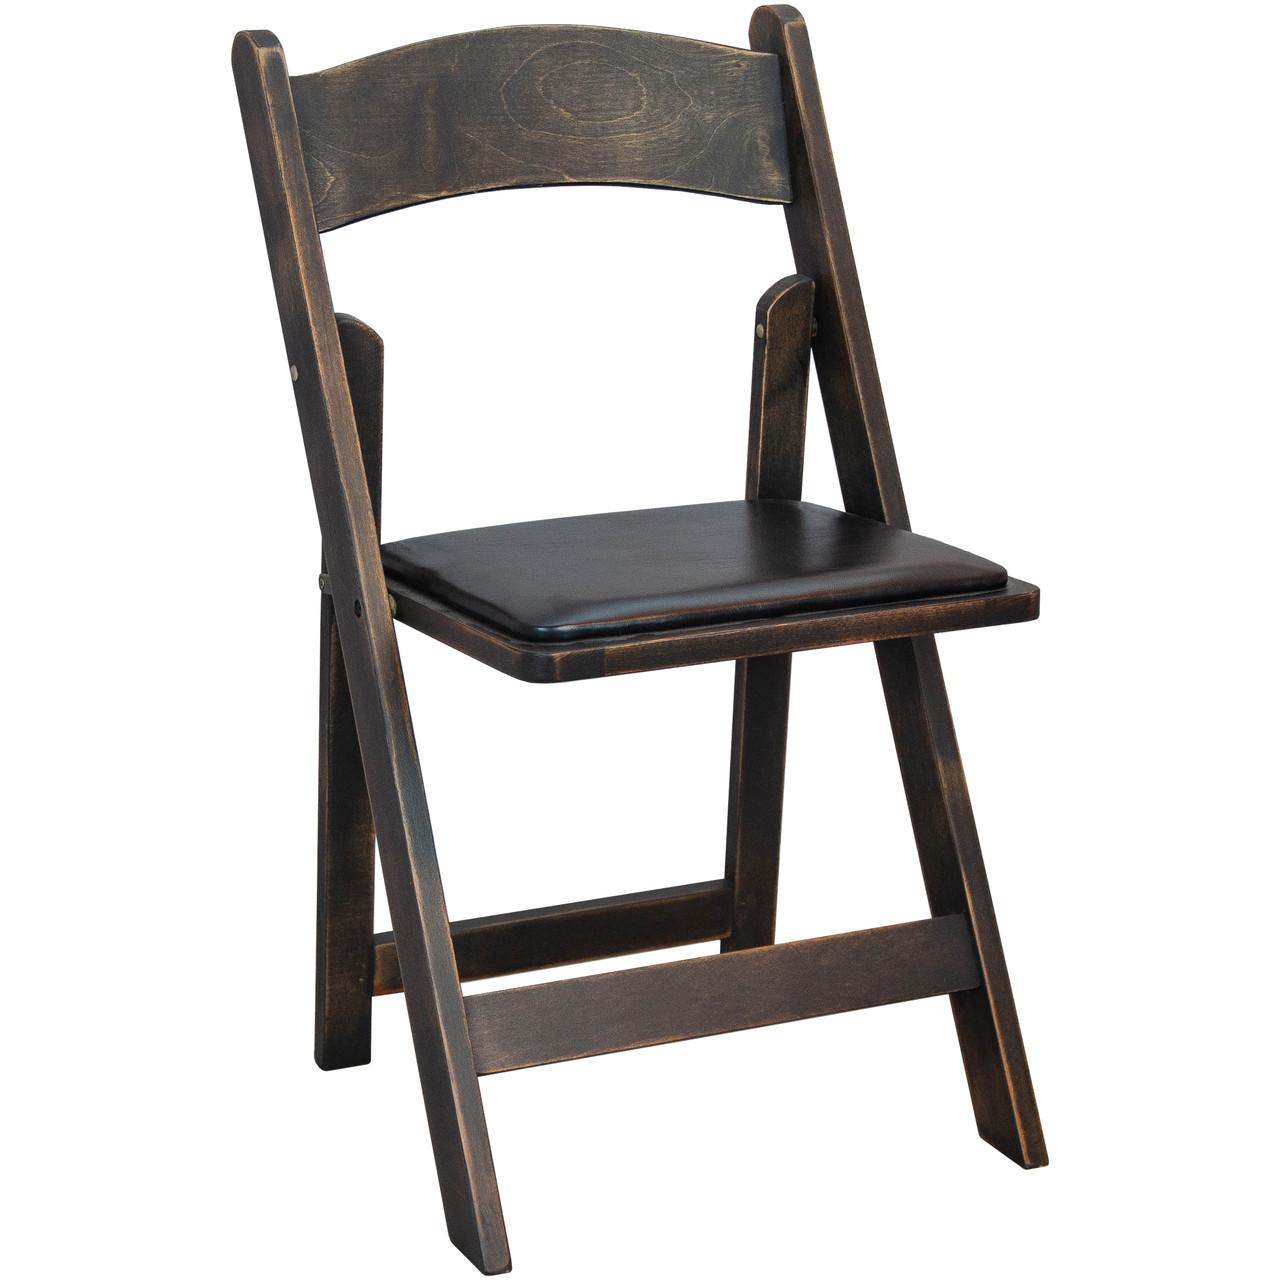 Antique Black Wood Folding Wedding Chair | Padded Wedding Chairs For Sale - Antique Black Wood Folding Wedding Chair Padded Wedding Chairs For